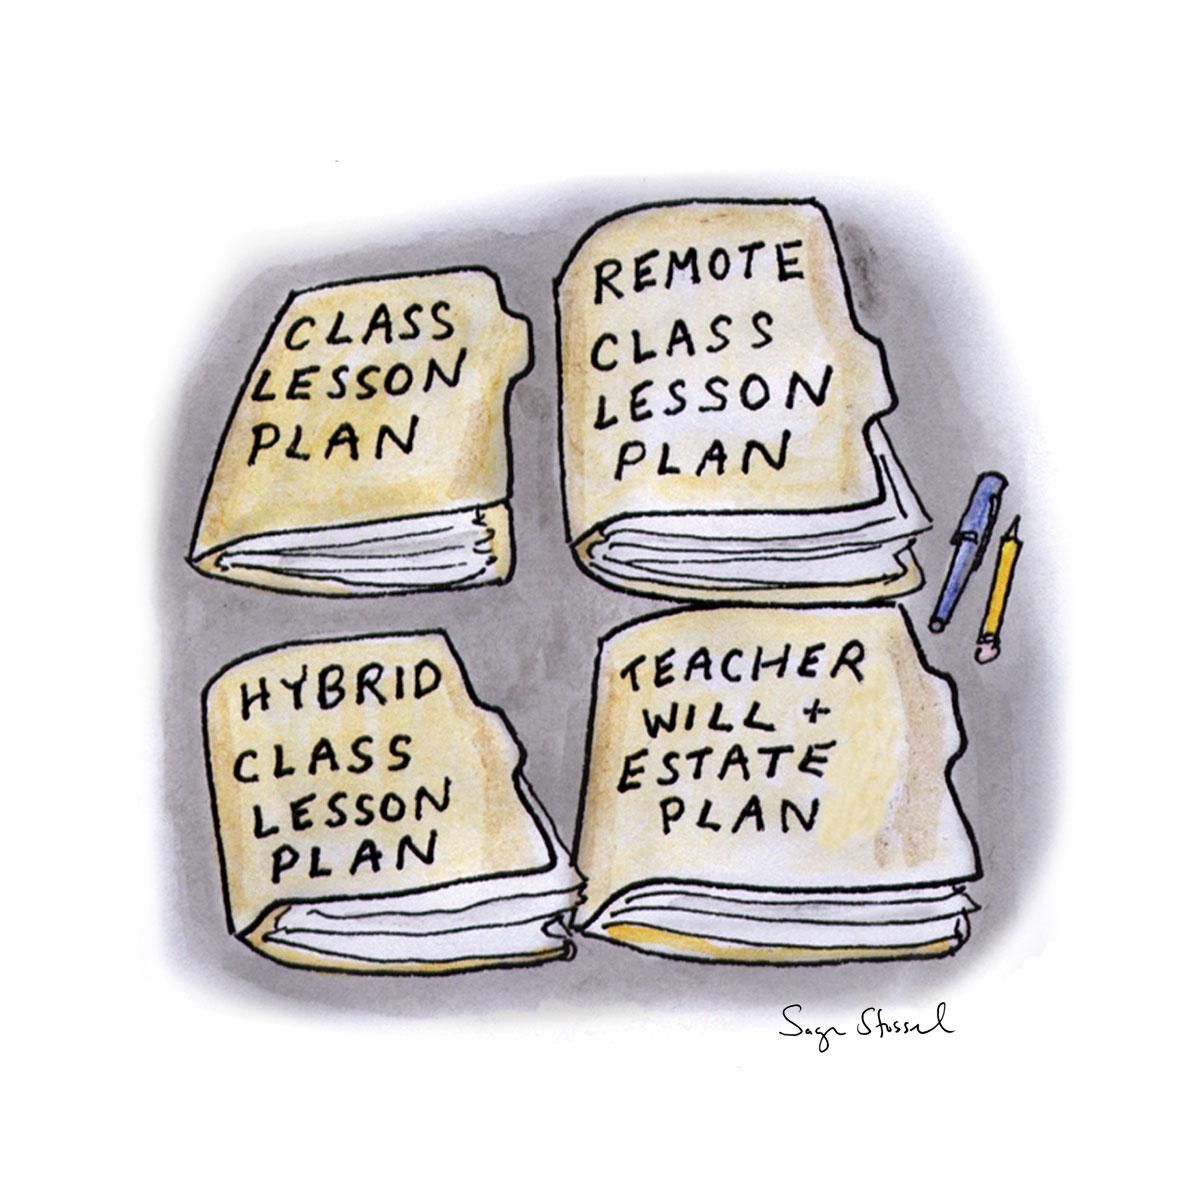 teachers, teaching, hazards, risks, coronavirus, covid-19, safety, cdc guidelines, transmission, lesson plans, hybrid, cartooning,  cartoon, sage stossel